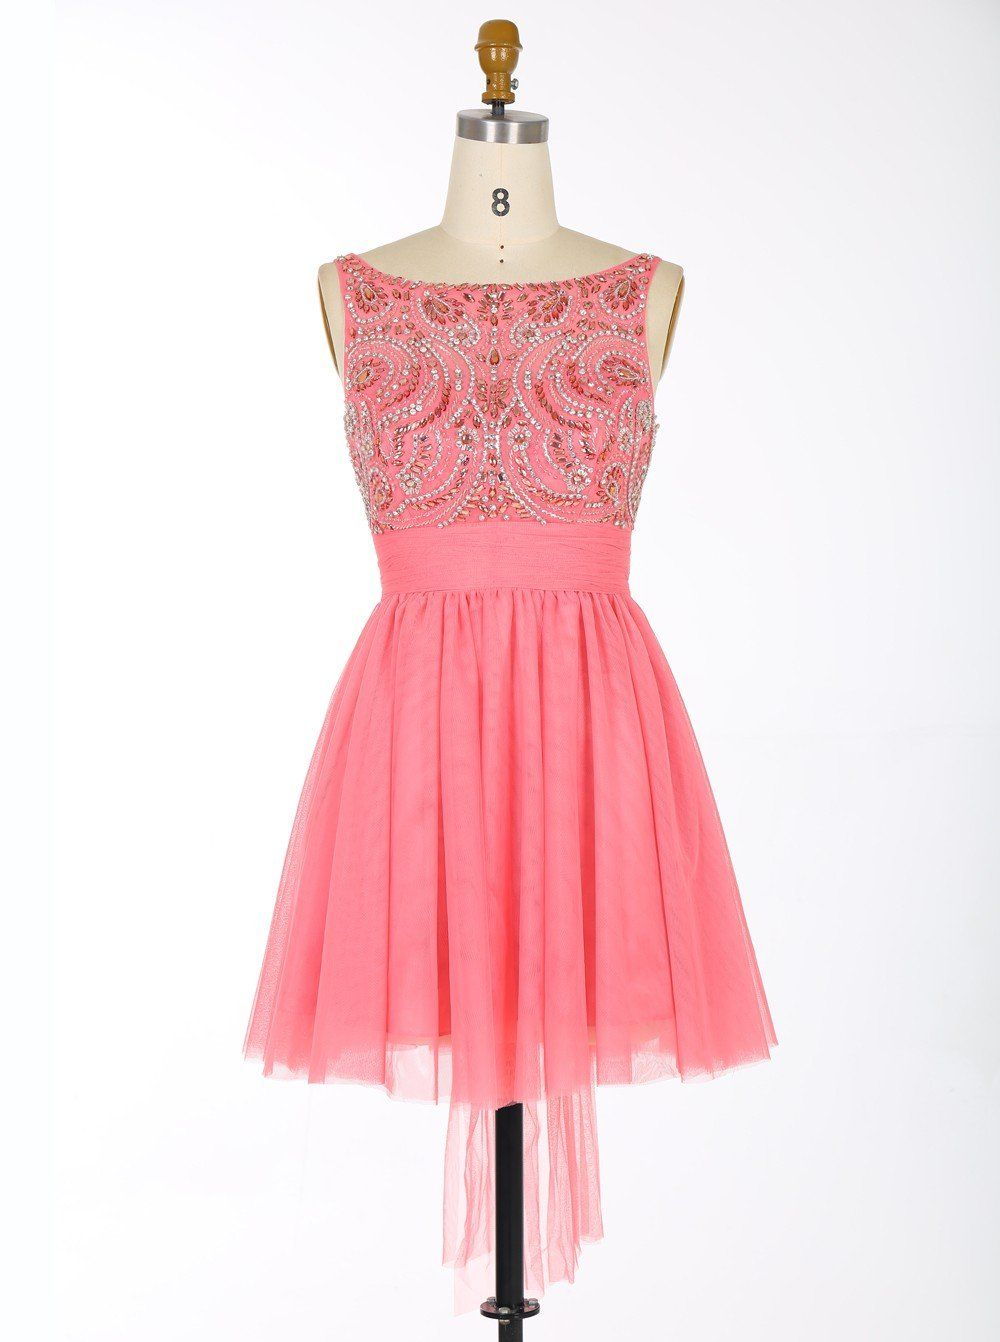 Watermelon homecoming dresssweet dressshort homecoming dress